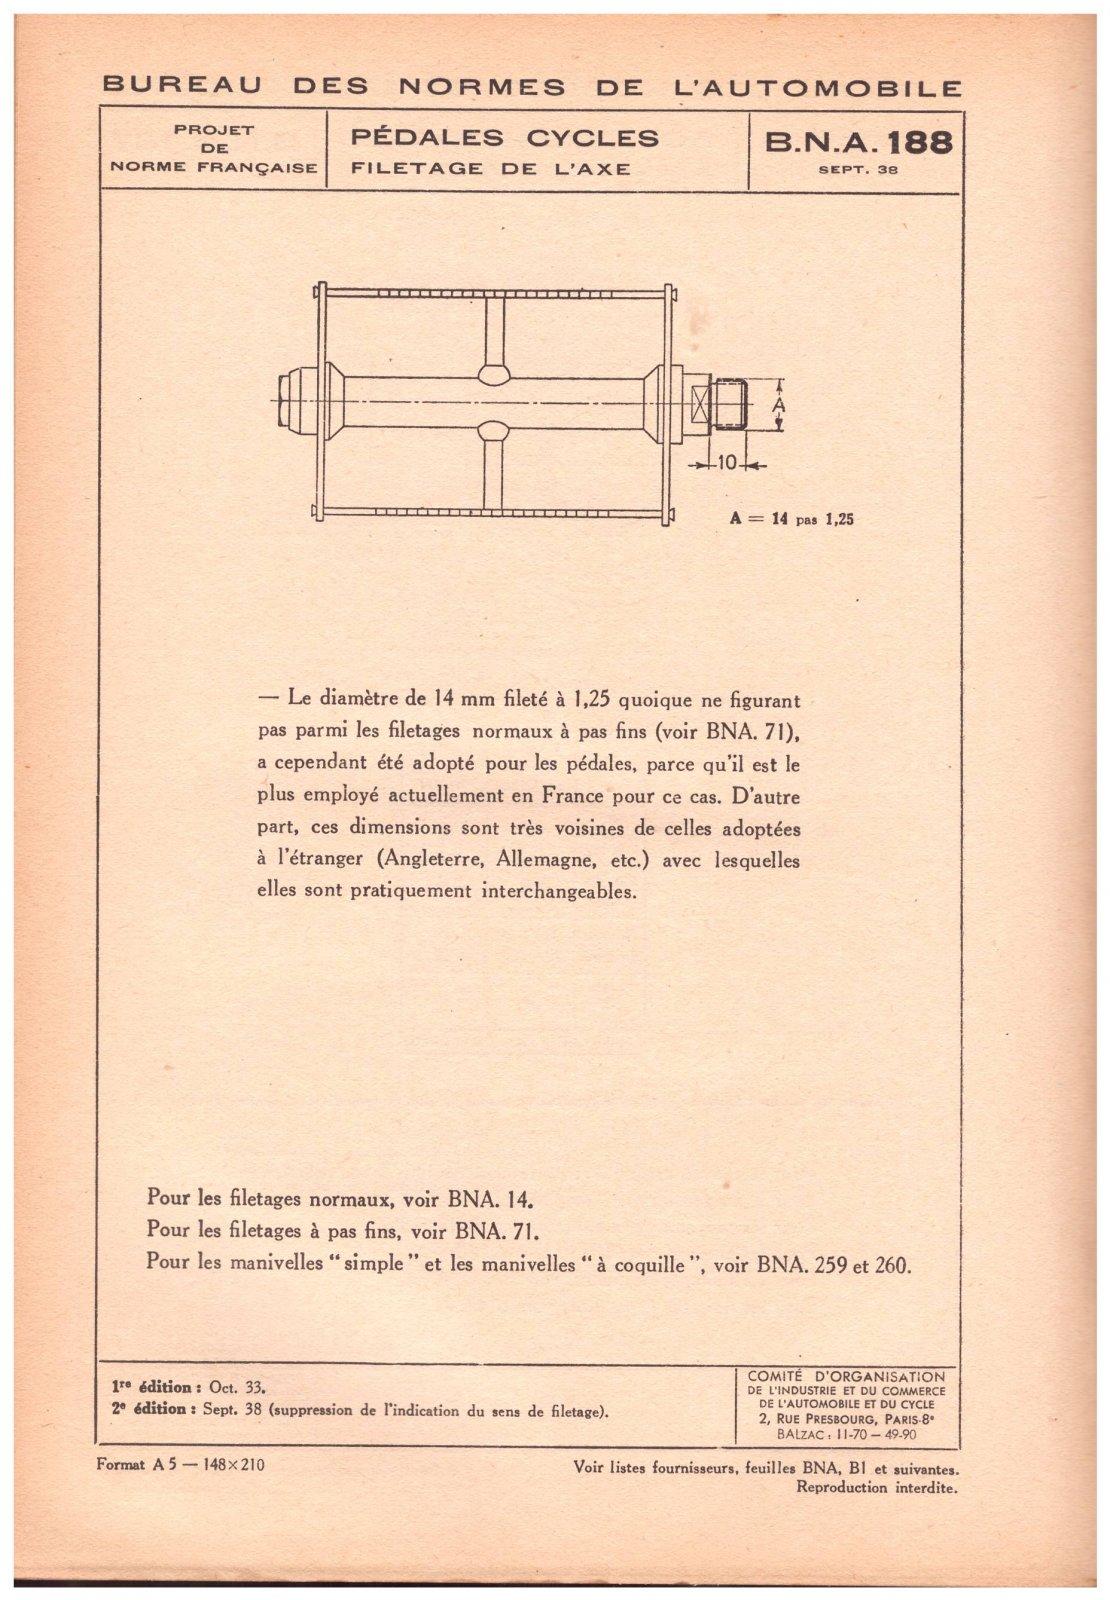 B.N.A.188.jpg